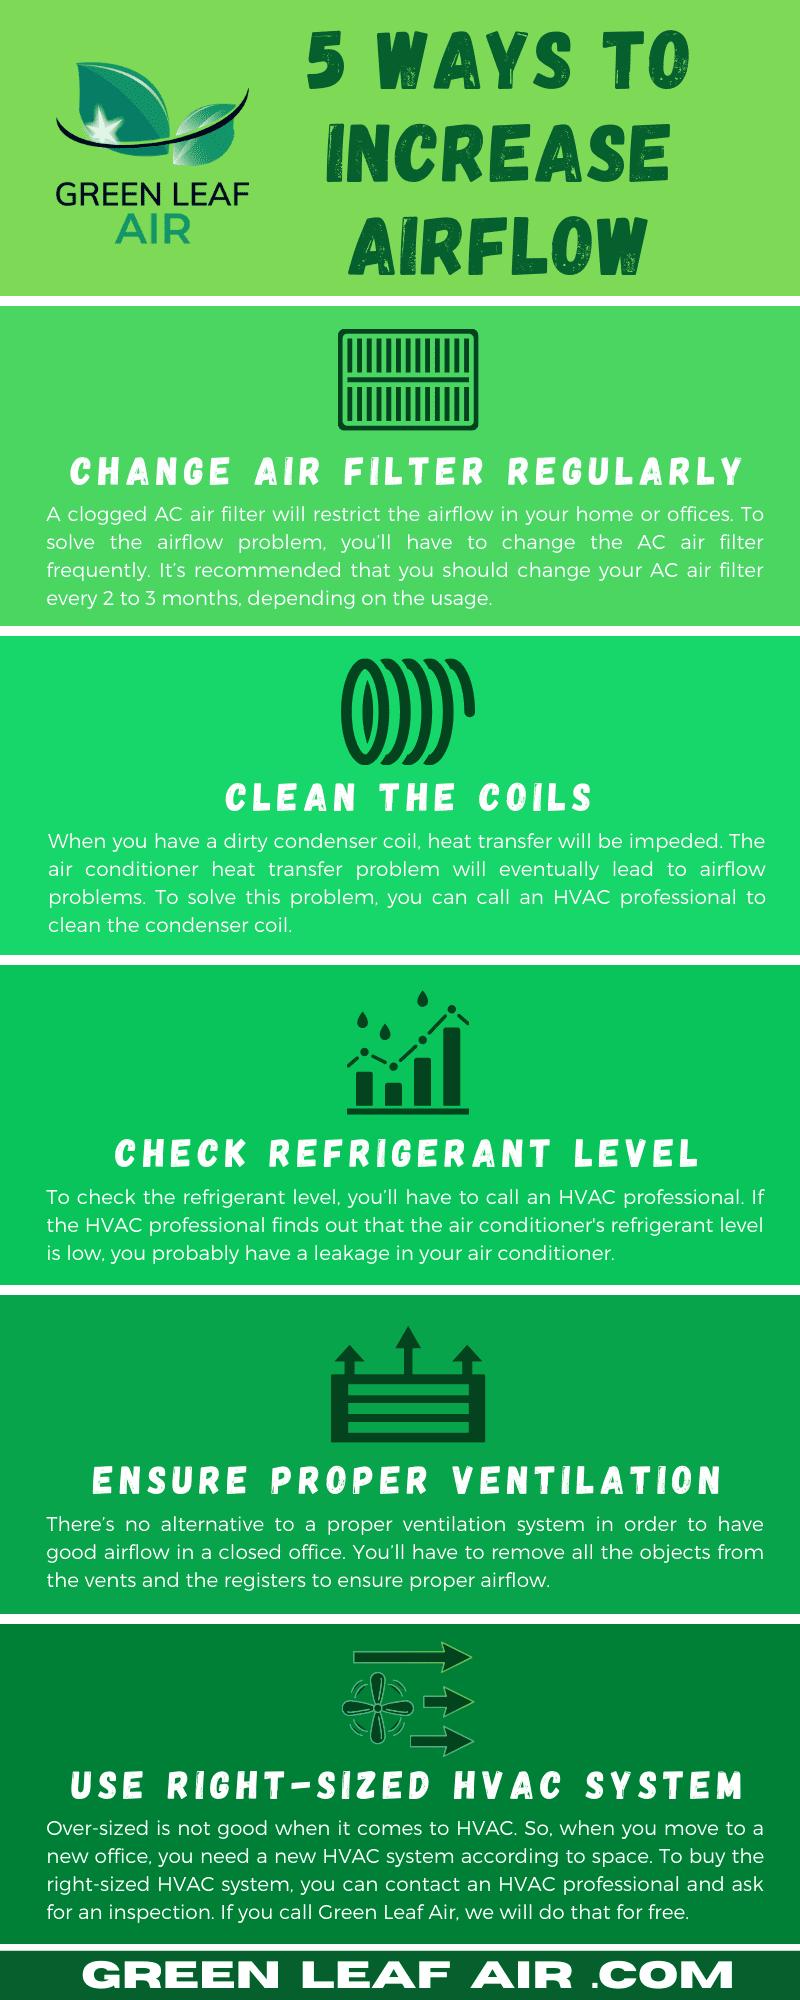 5 Ways to Increase Airflow